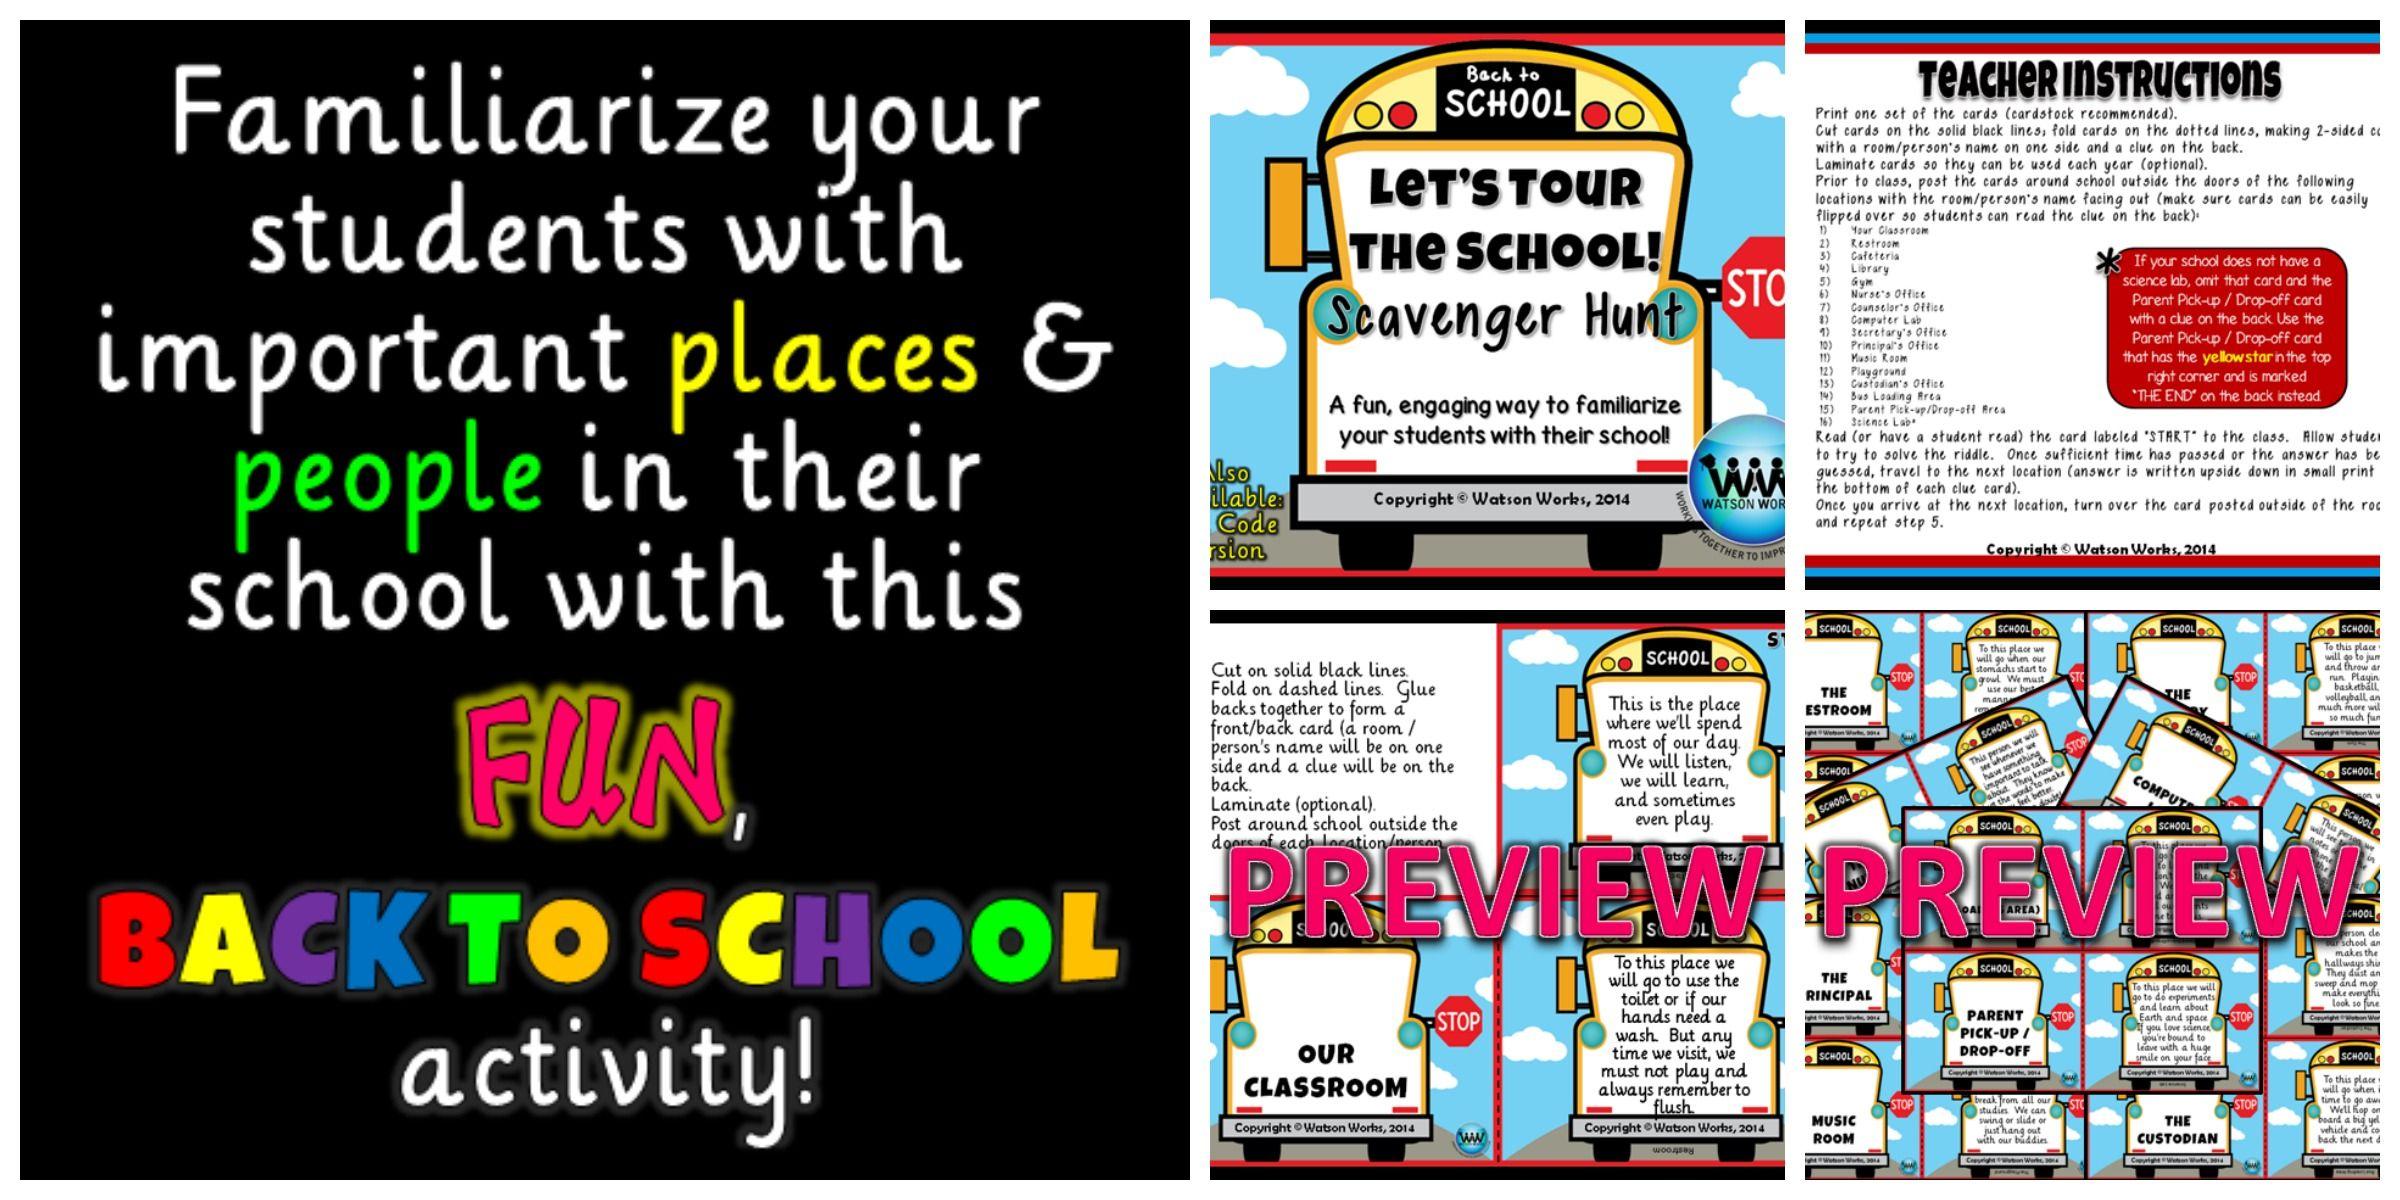 Let S Tour The School Scavenger Hunt A Back To School Activity